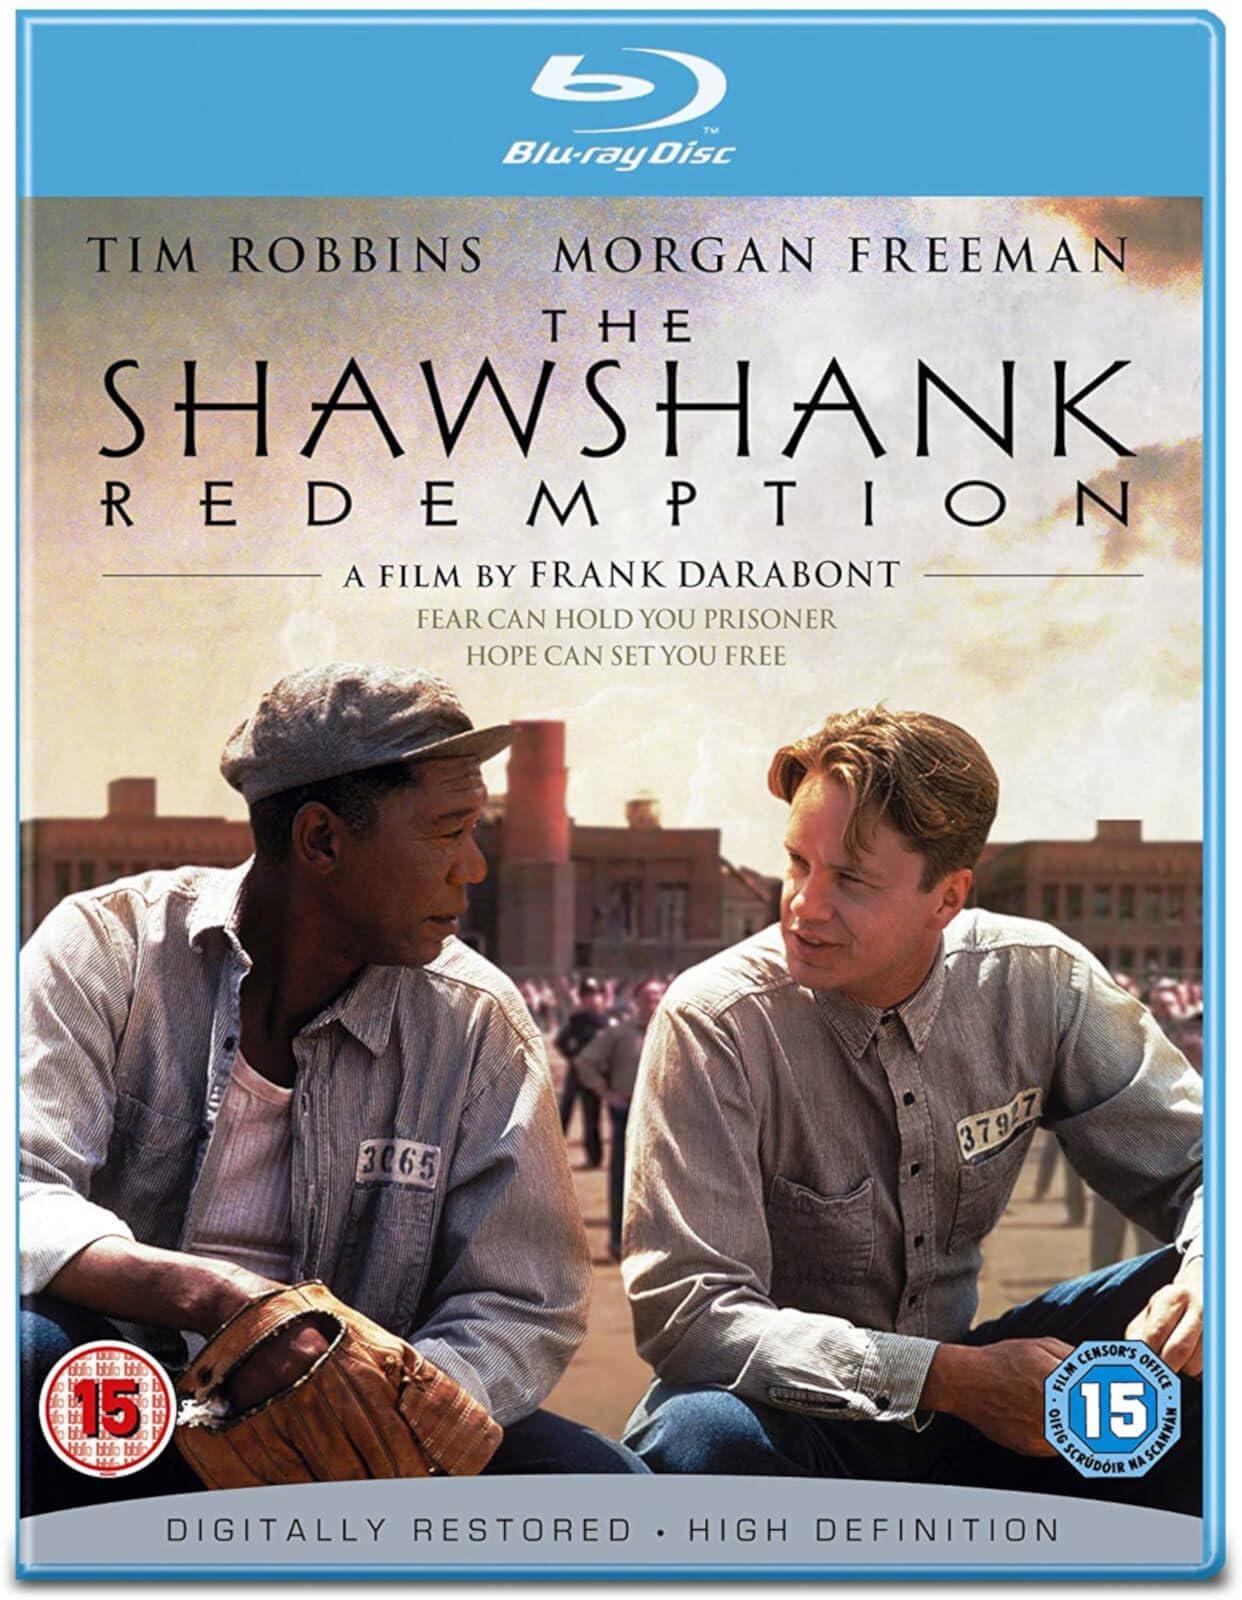 The Shawshank Redemption (1994) Hindi Dubbed